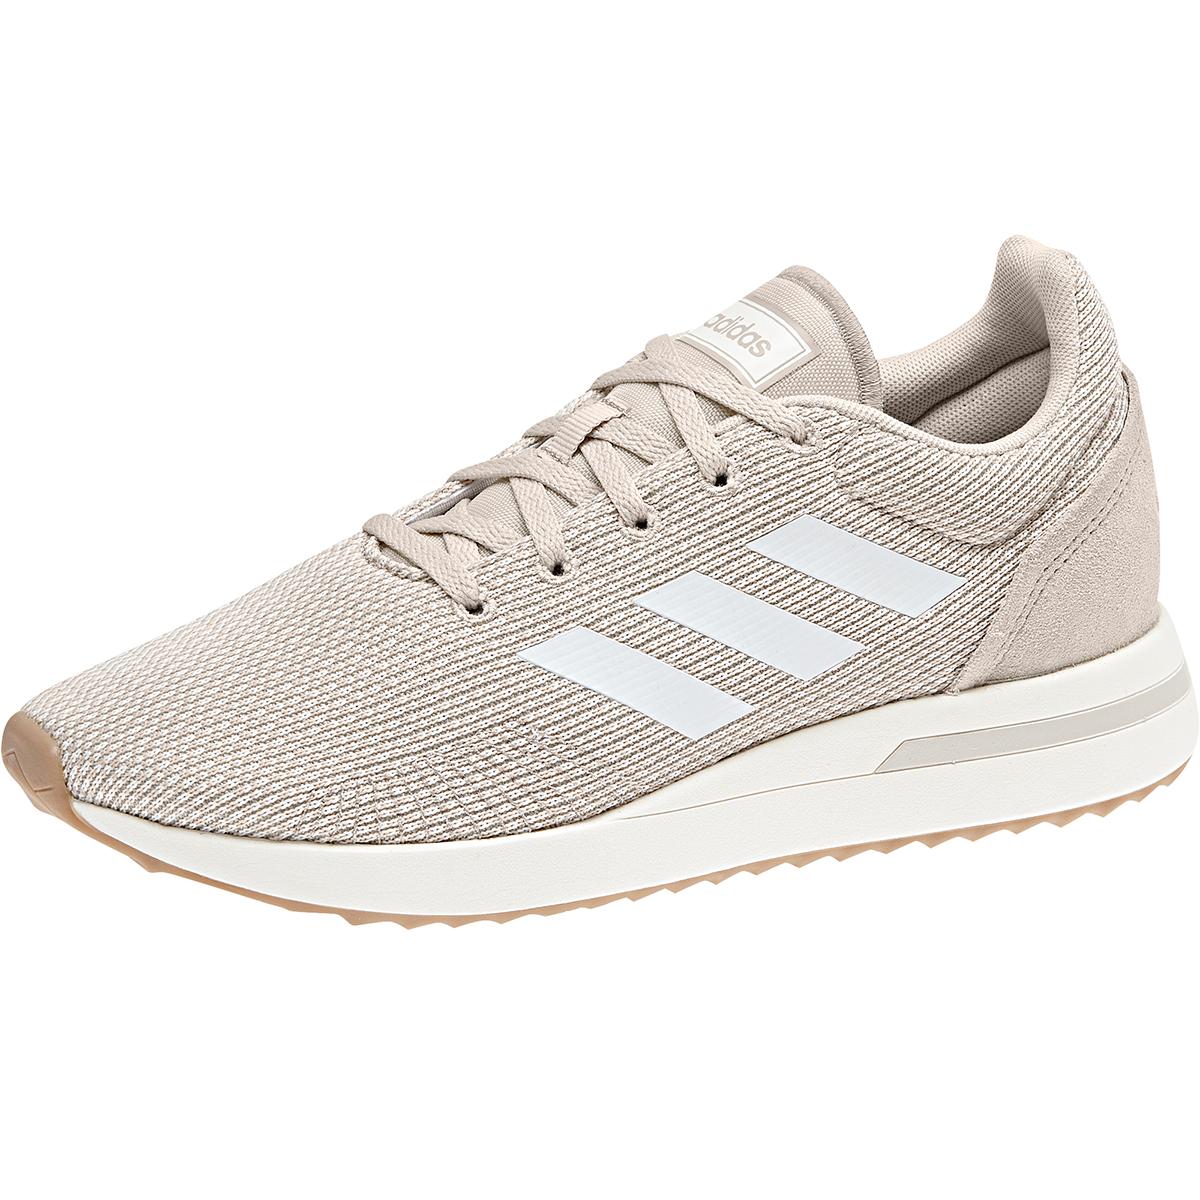 Essentials Run 70s Running Shoes